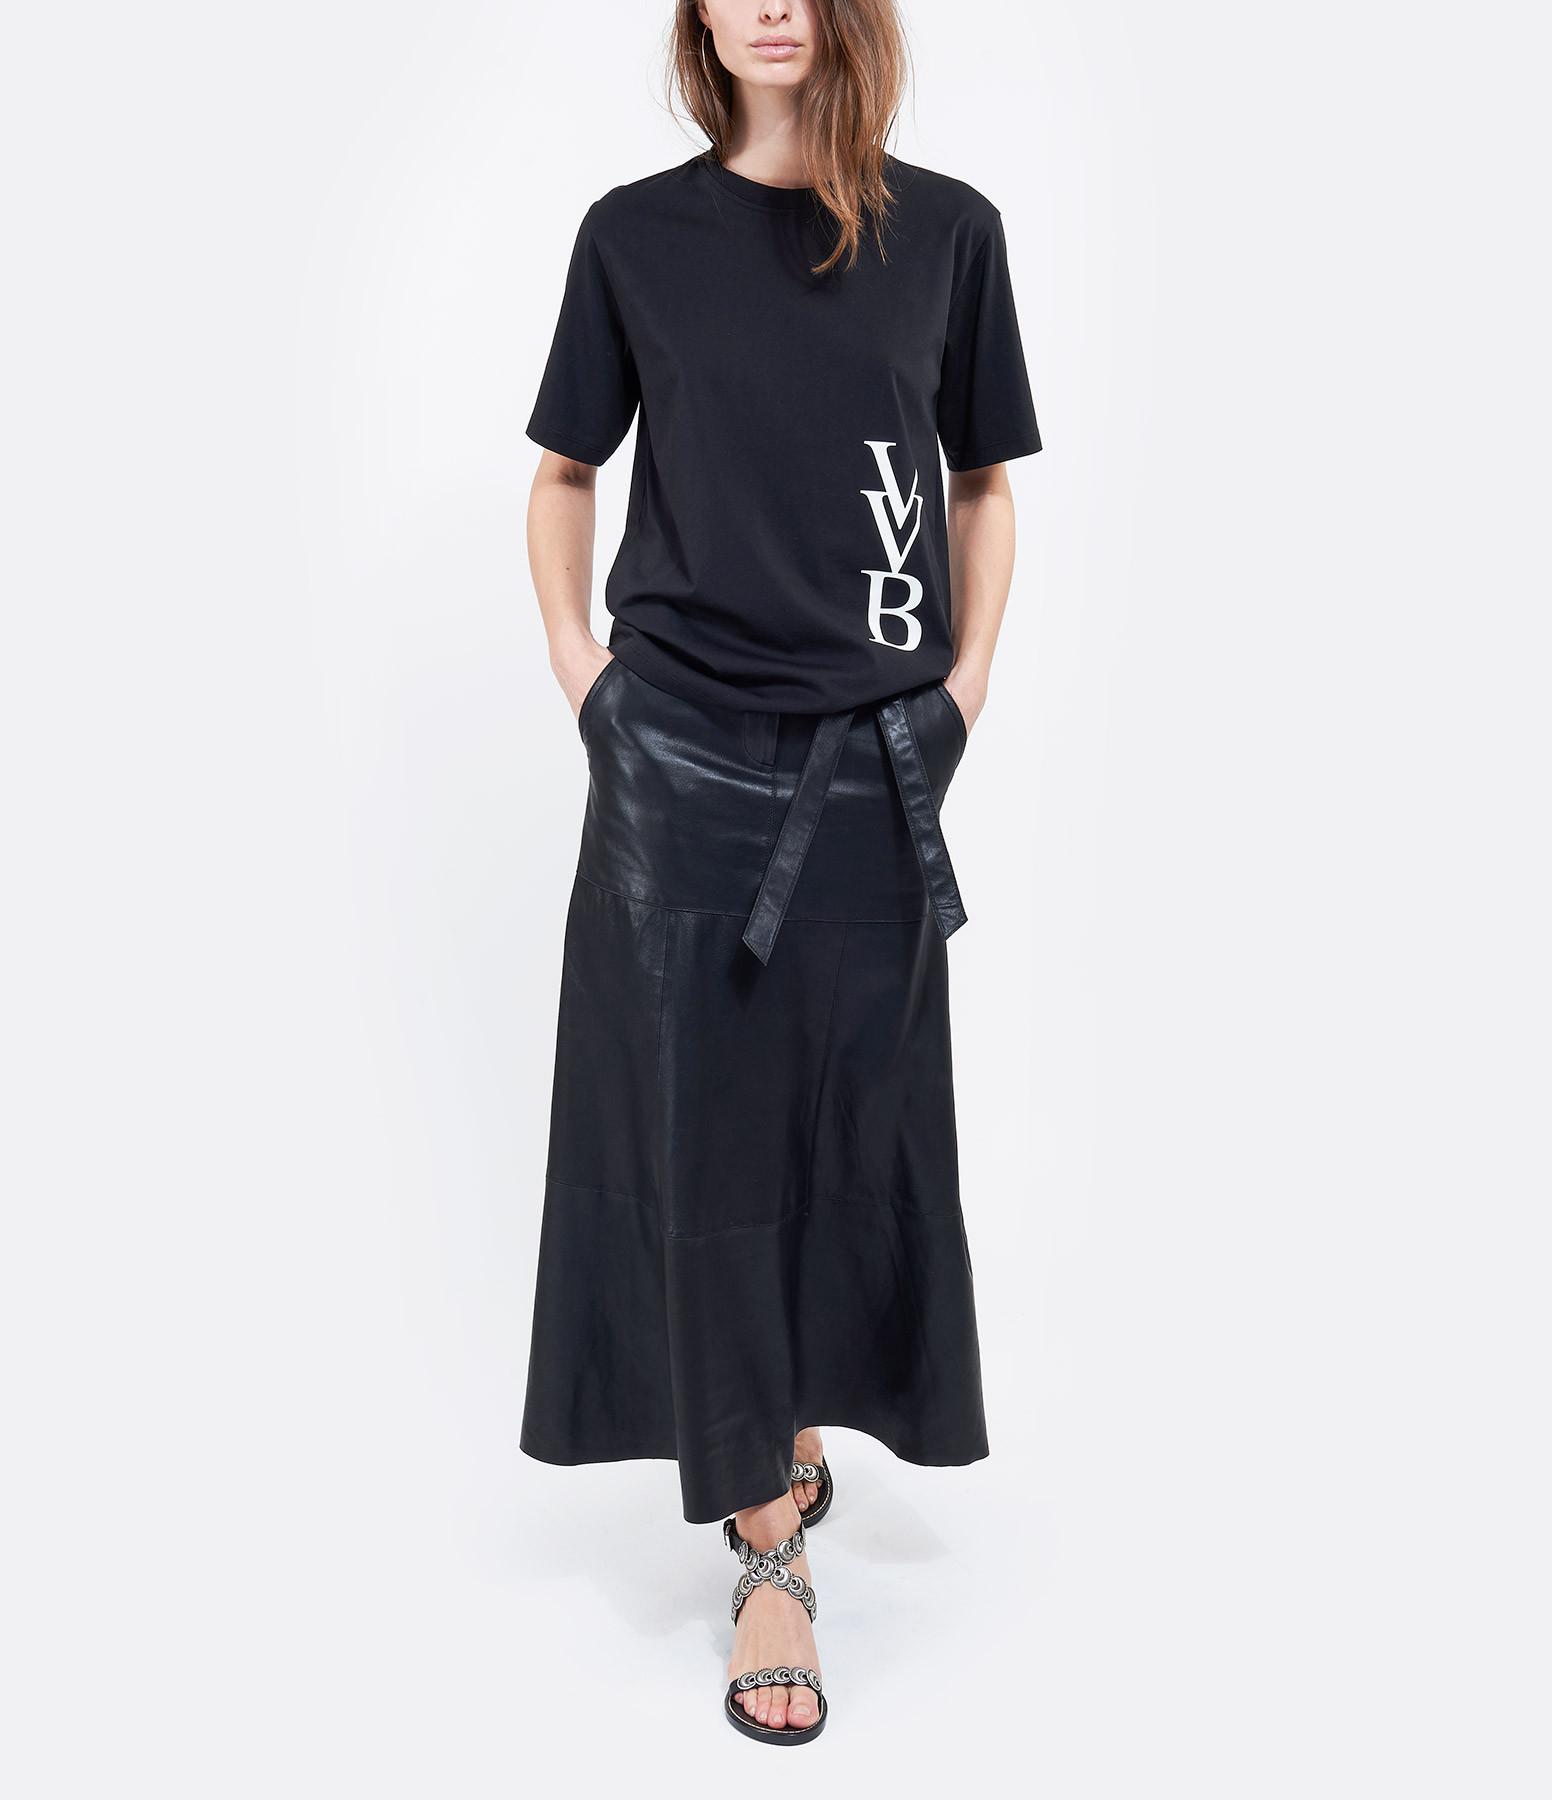 VICTORIA VICTORIA BECKHAM - Tee-shirt VVB Coton Noir